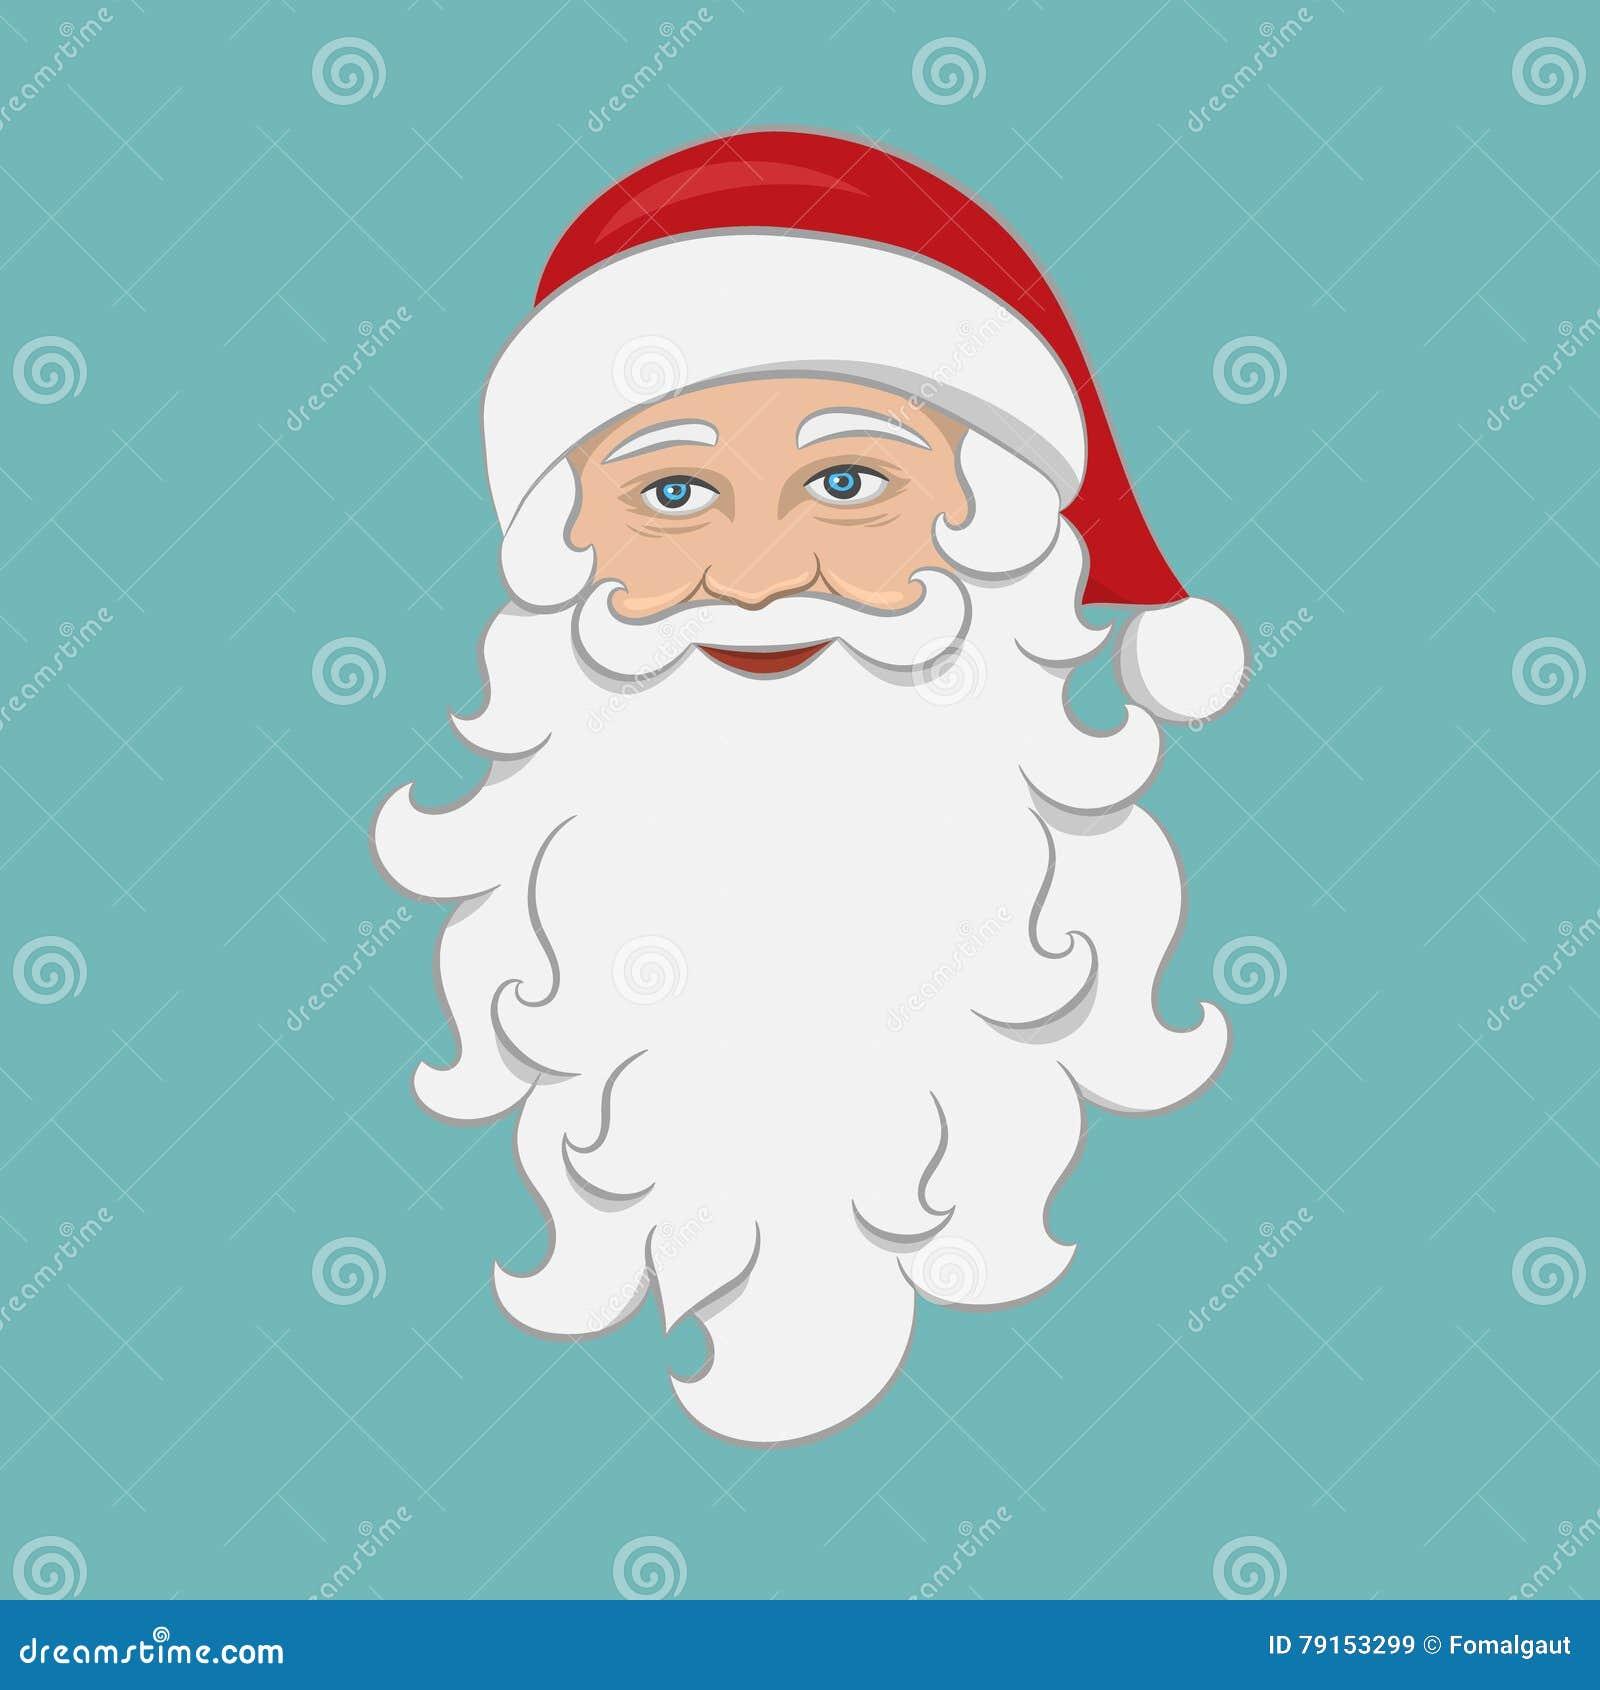 Christmas Holiday Clipart.Santa Claus Isolated Cartoon Character Merry Christmas